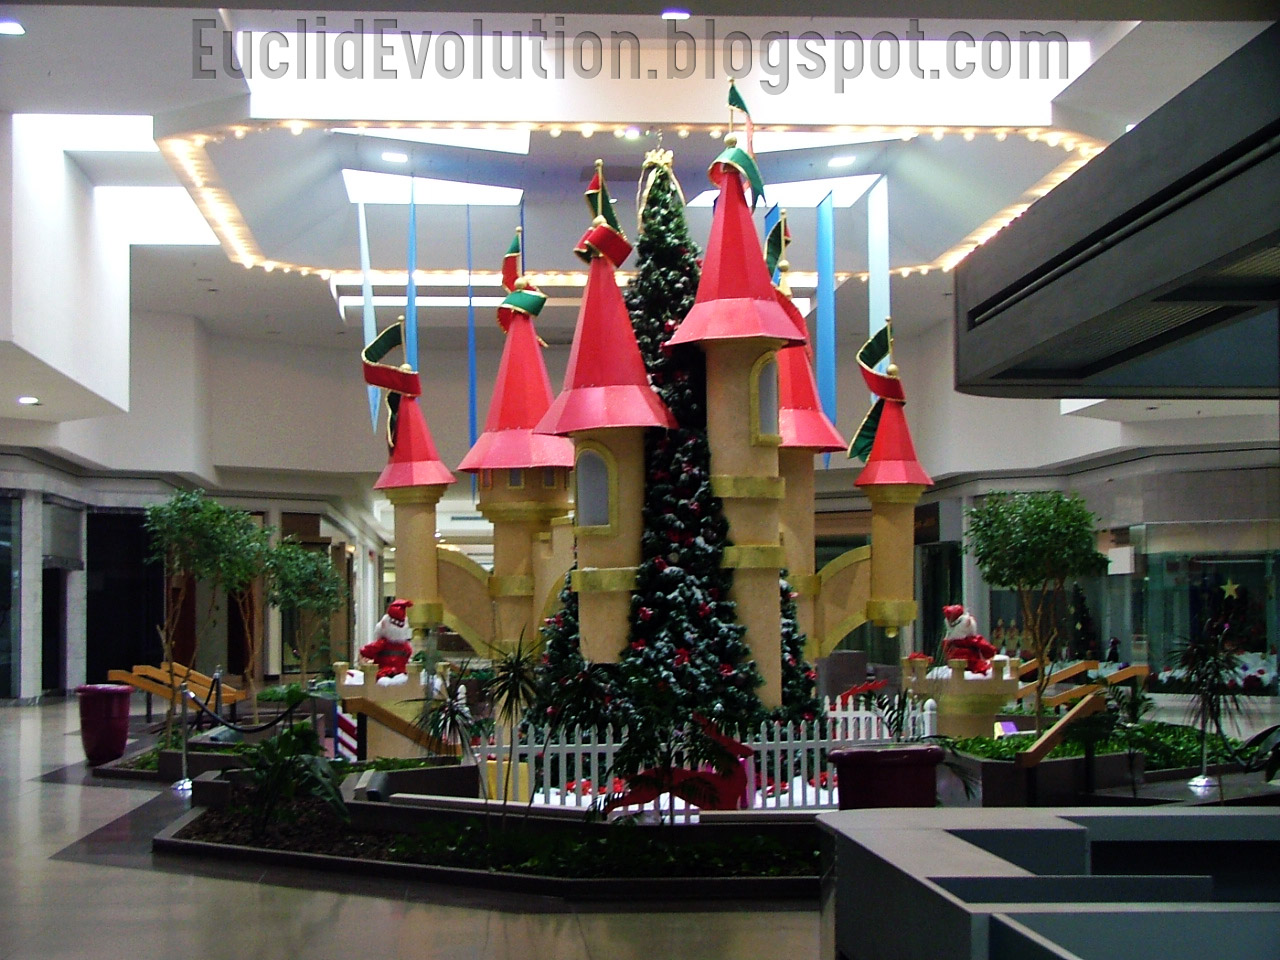 Euclid Square Mall Santa Christmas Castle - Euclid Evolution